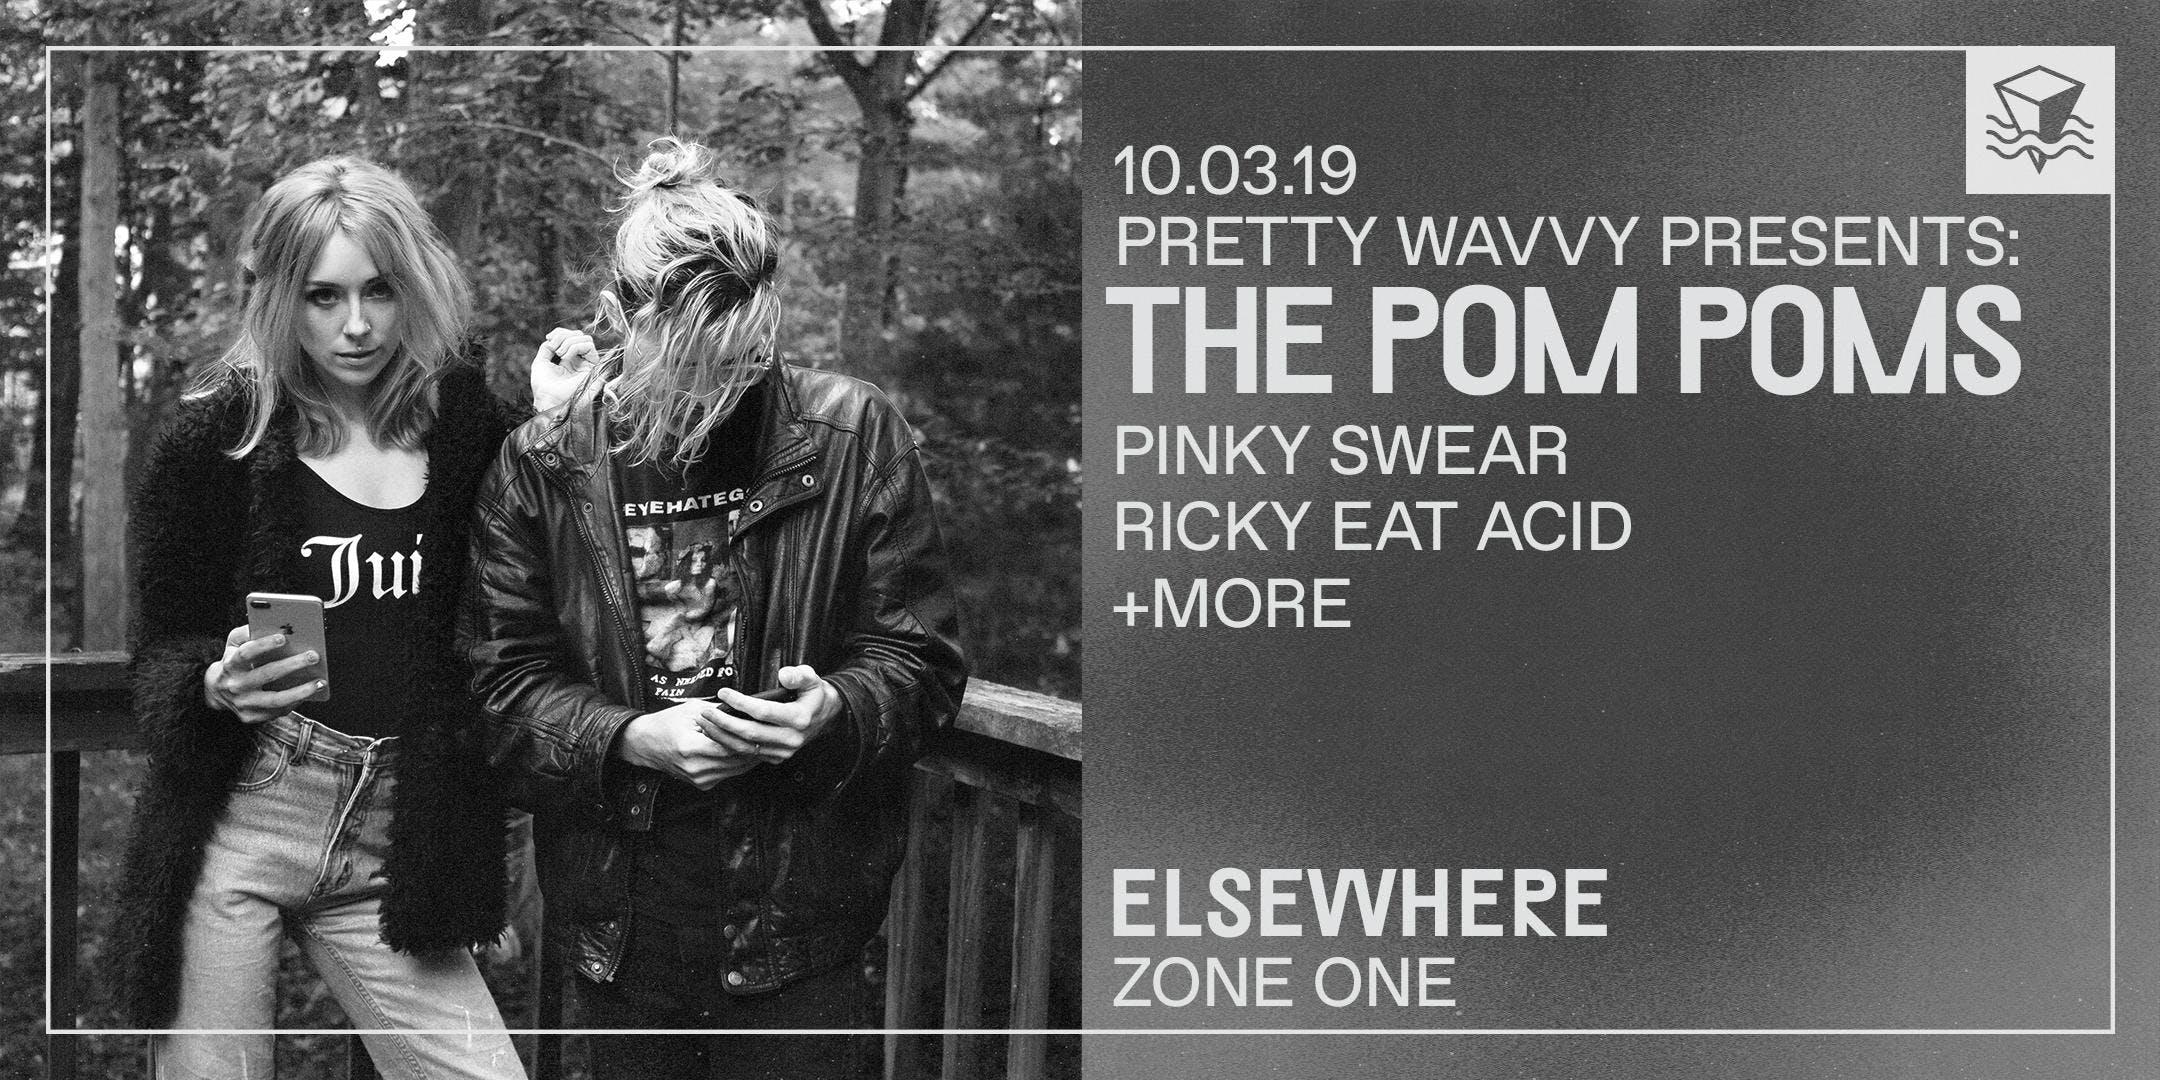 POSTPONED: Pretty Wavvy Presents: The Pom Poms, Pinky Swear, Ricky Eat Acid + more!